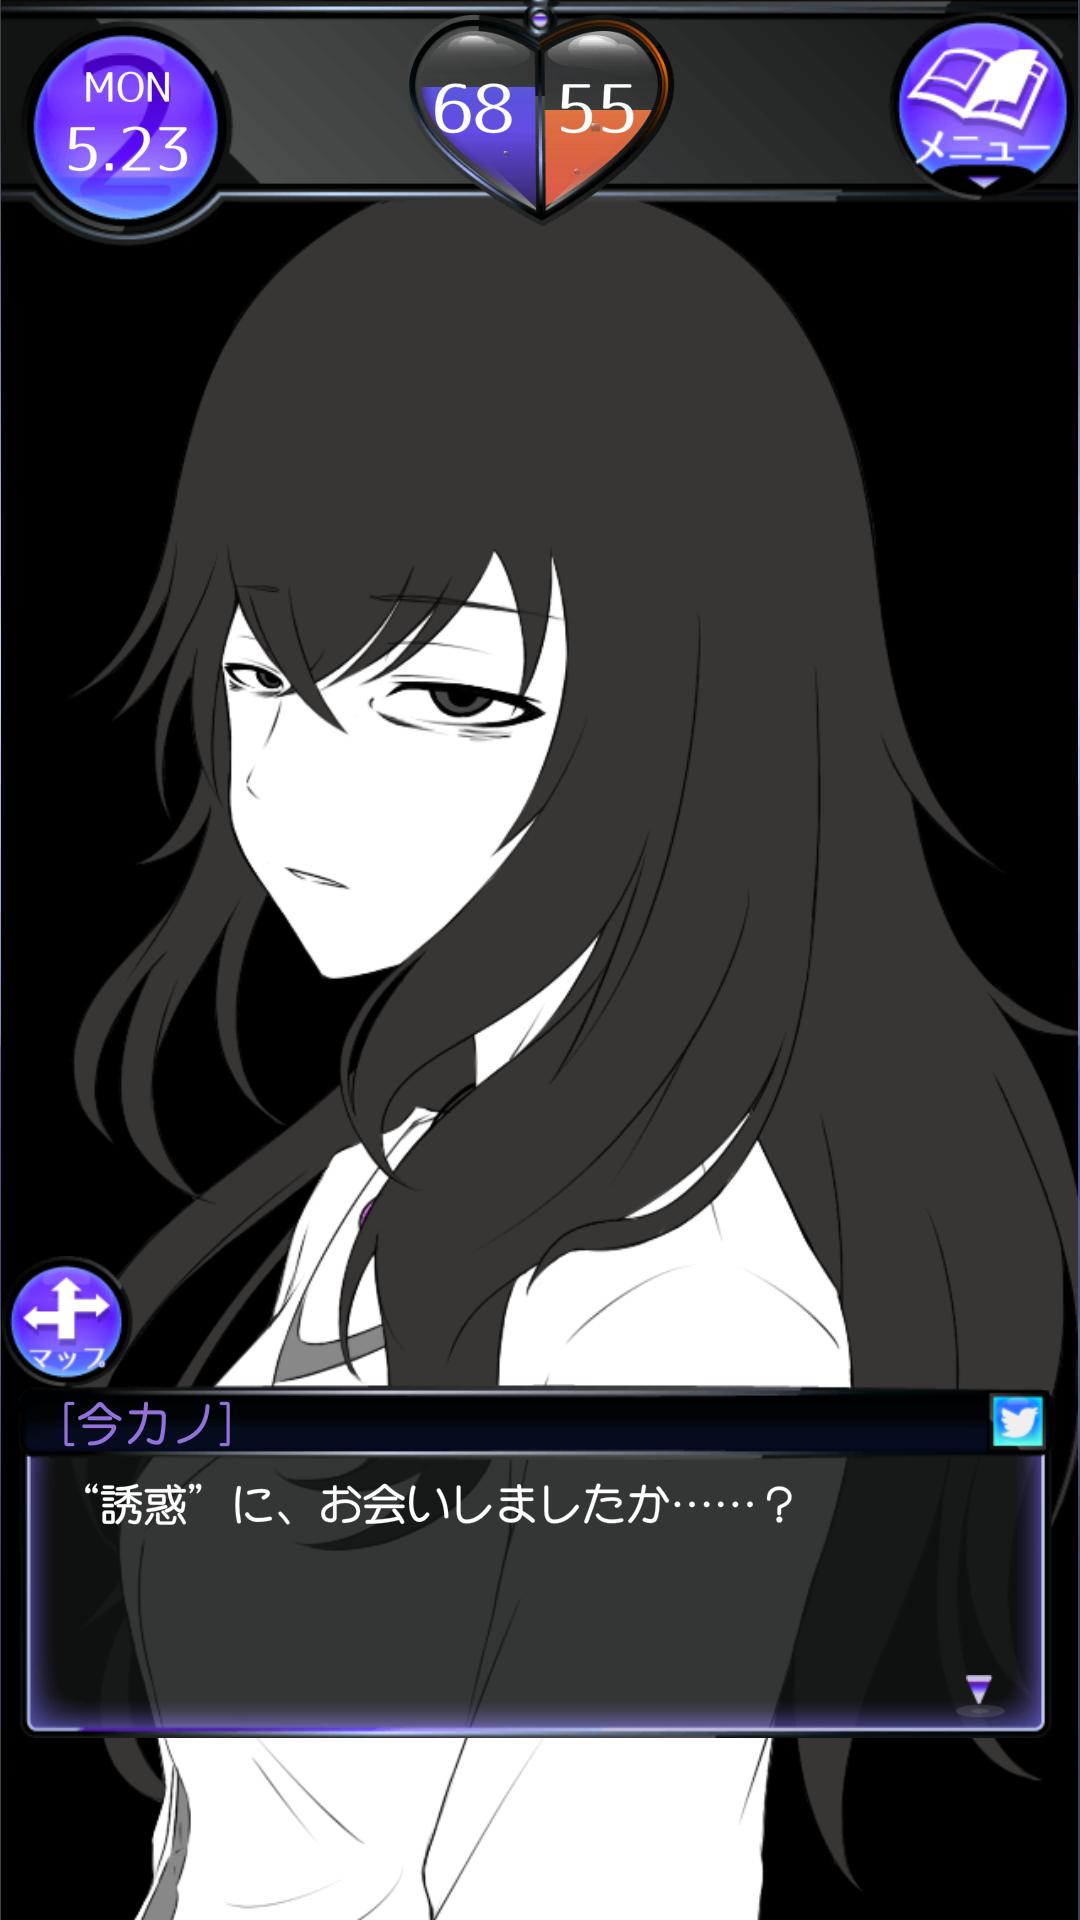 androidアプリ 元カノは友達だから問題ない攻略スクリーンショット6